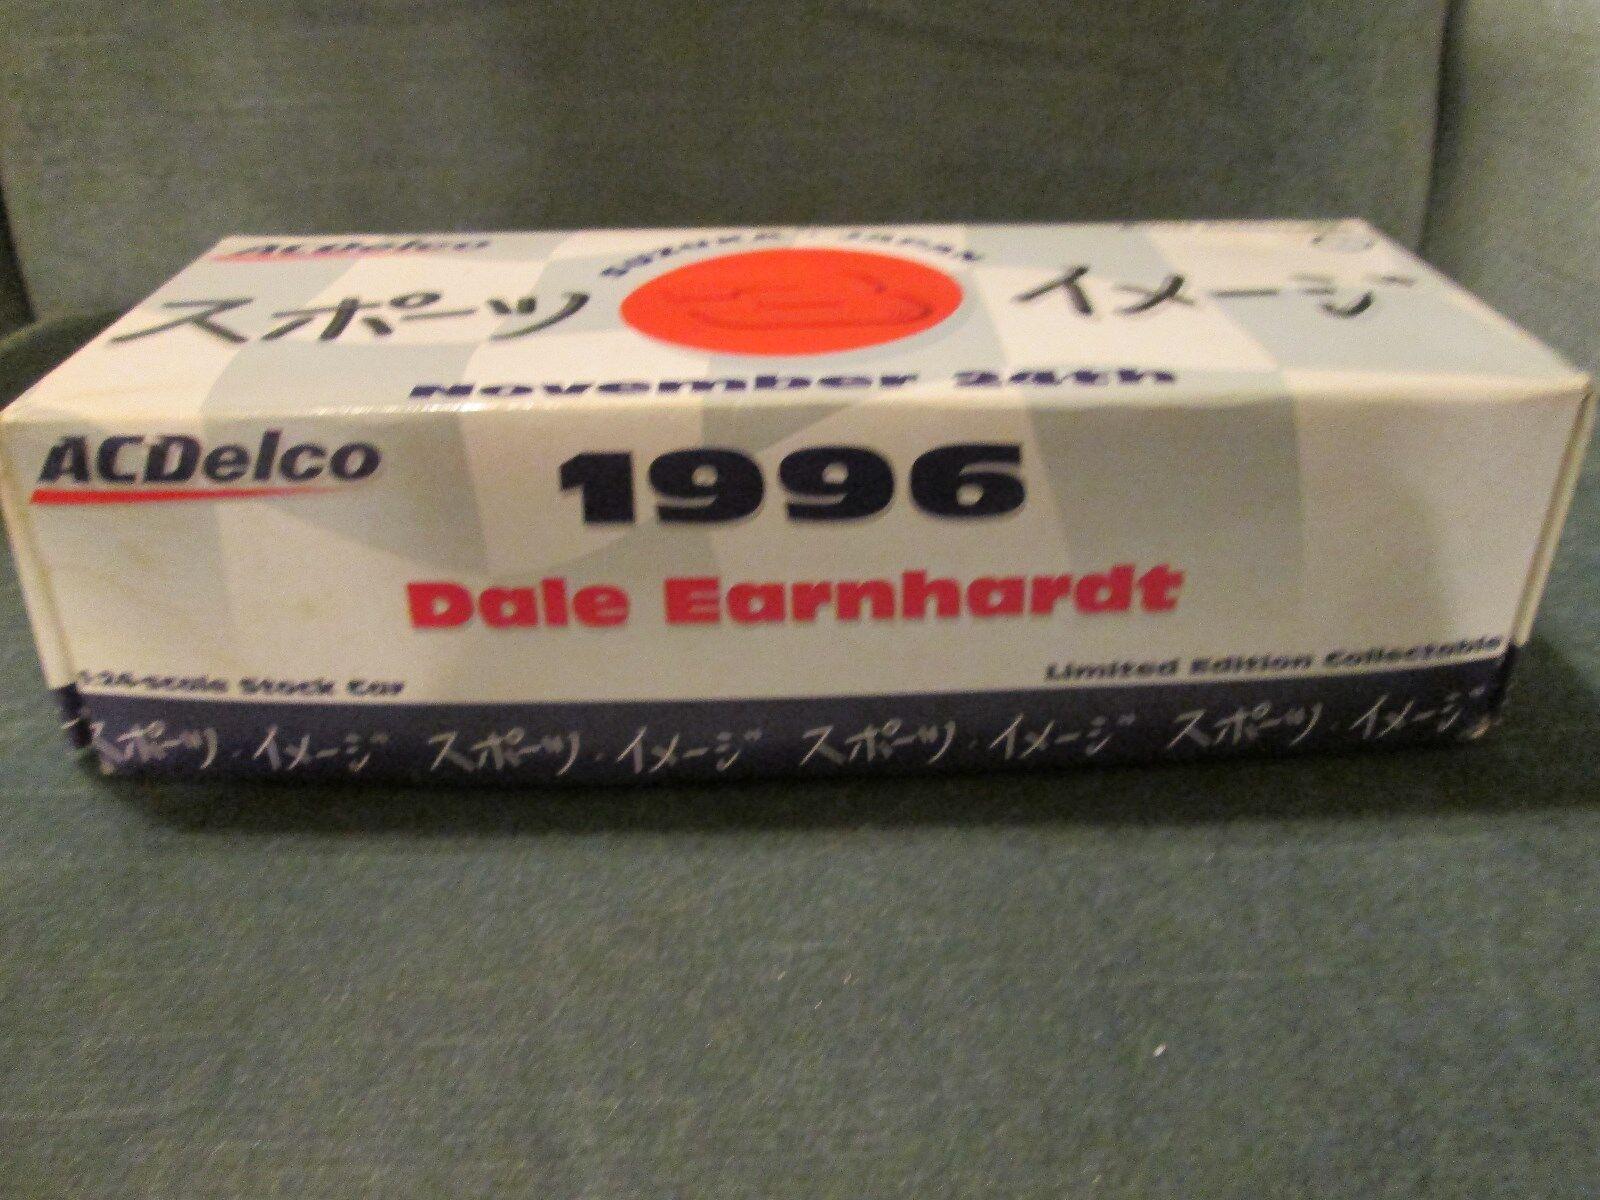 RCCA NASCAR 1 24 Club Car Dale Earnhardt AC Delco Delco Delco Suzuka Circuit 1996 Chevy 88ebd4